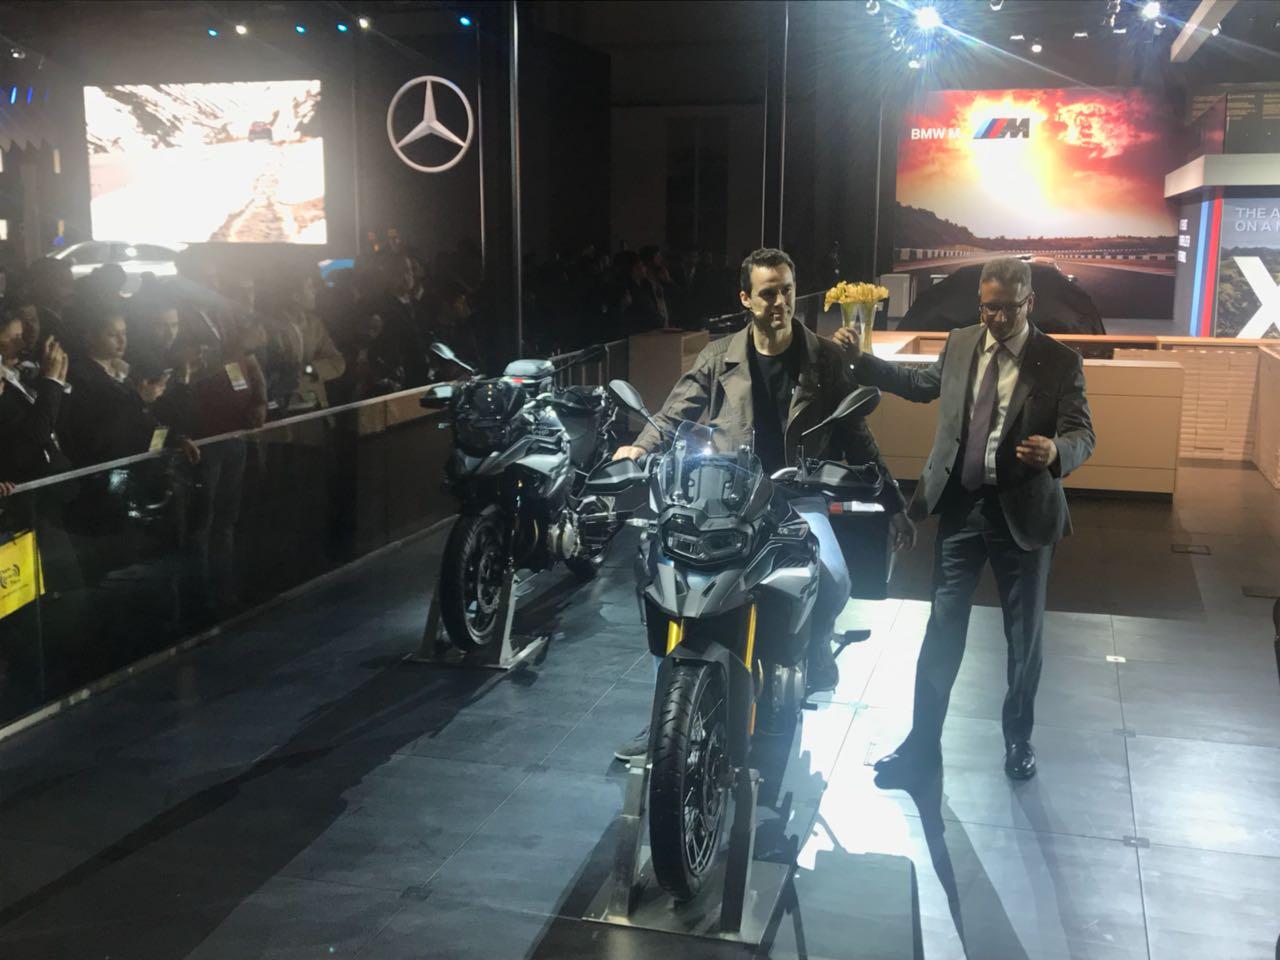 <p>BMW F750 and F850 GS showcased</p>